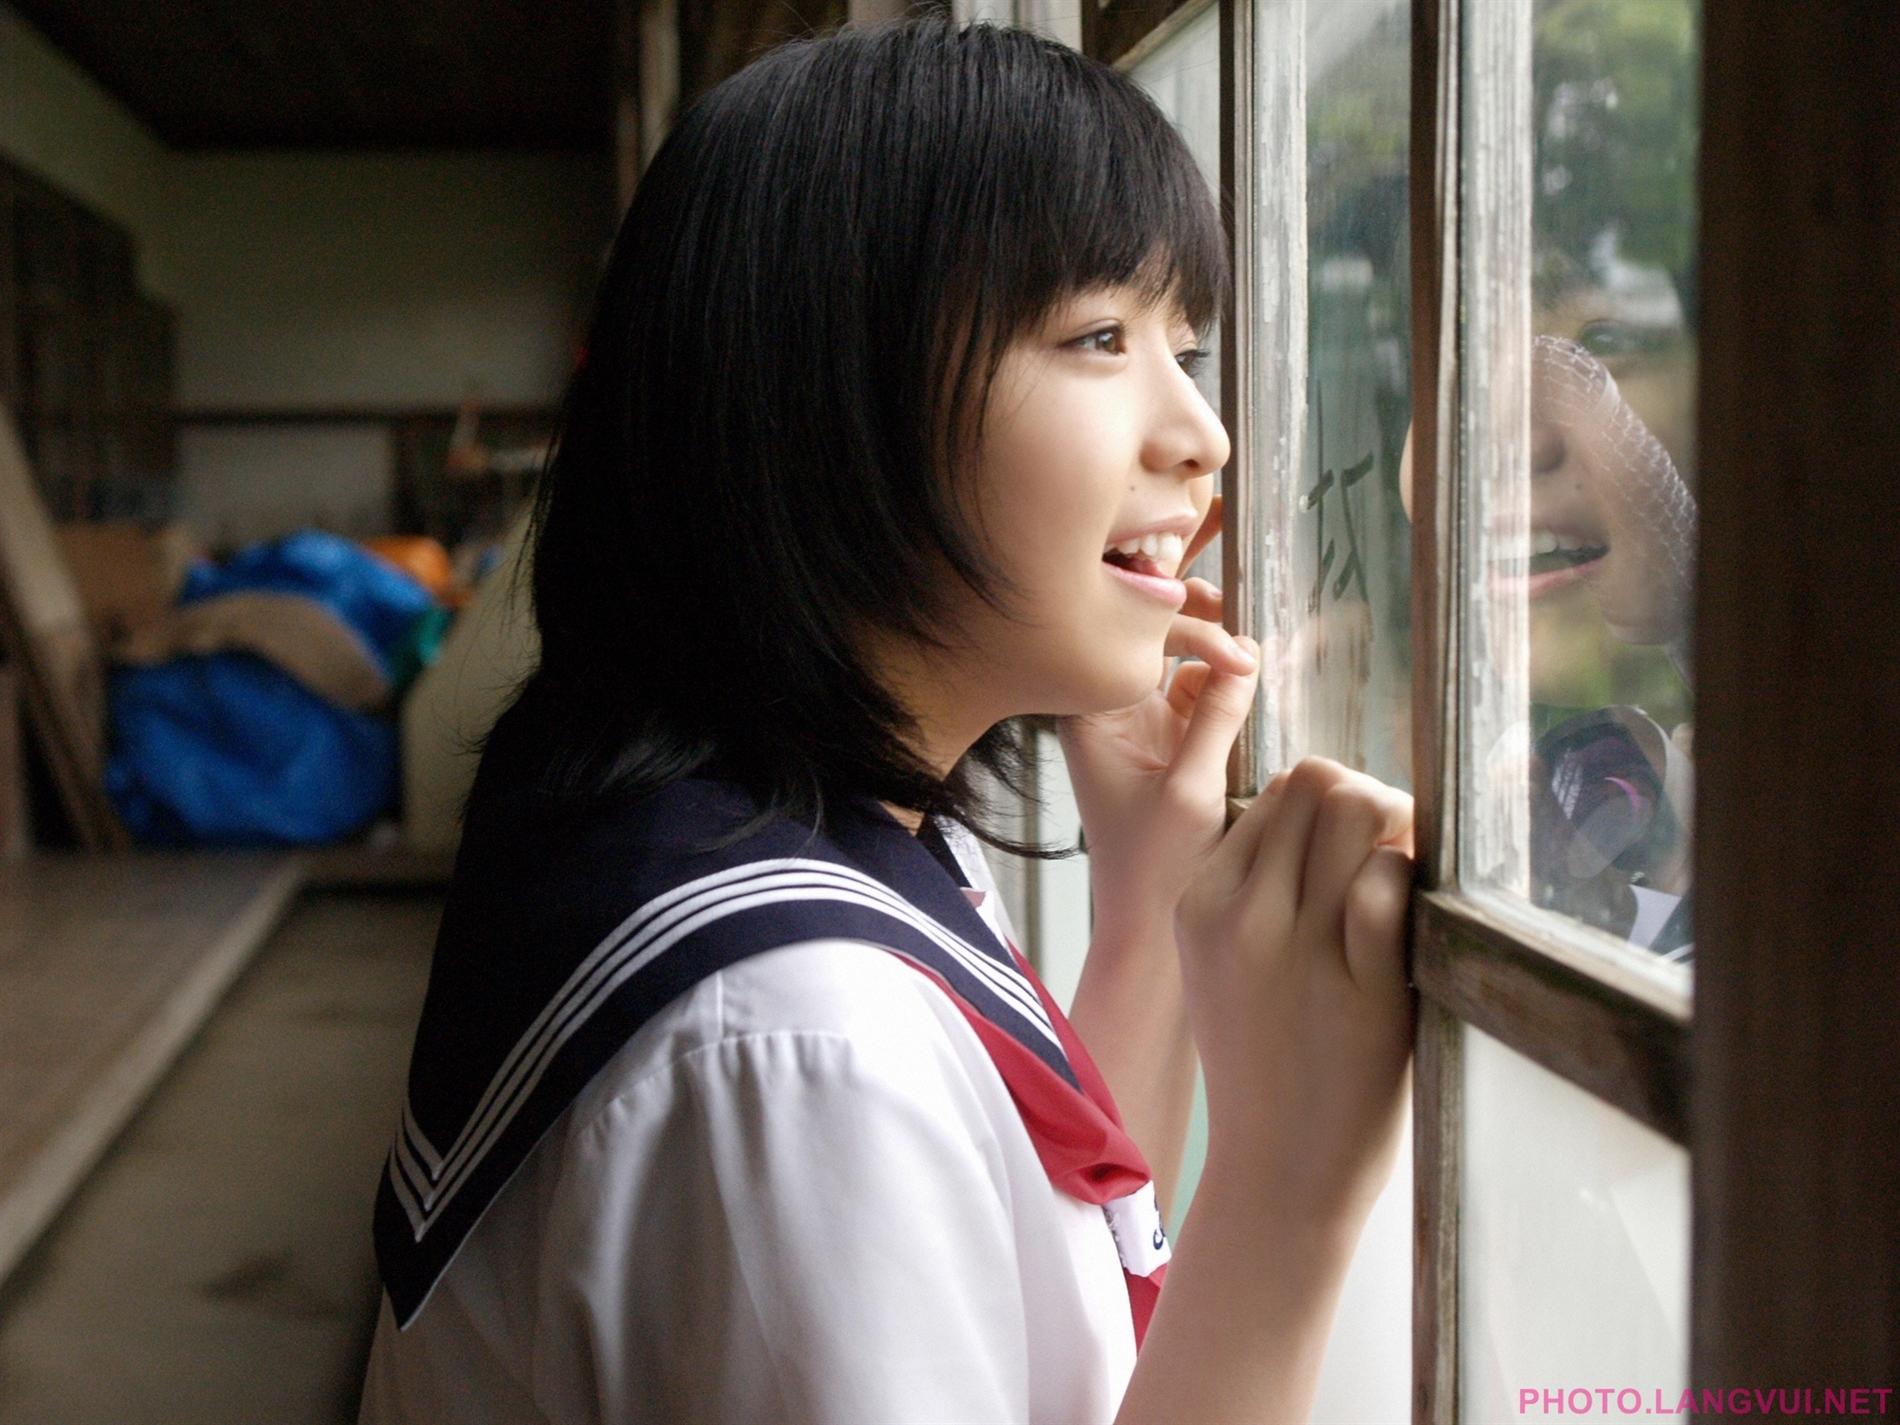 YS Web Vol 336 Shizuka Nakamura 3rd week - Ảnh Girl Xinh